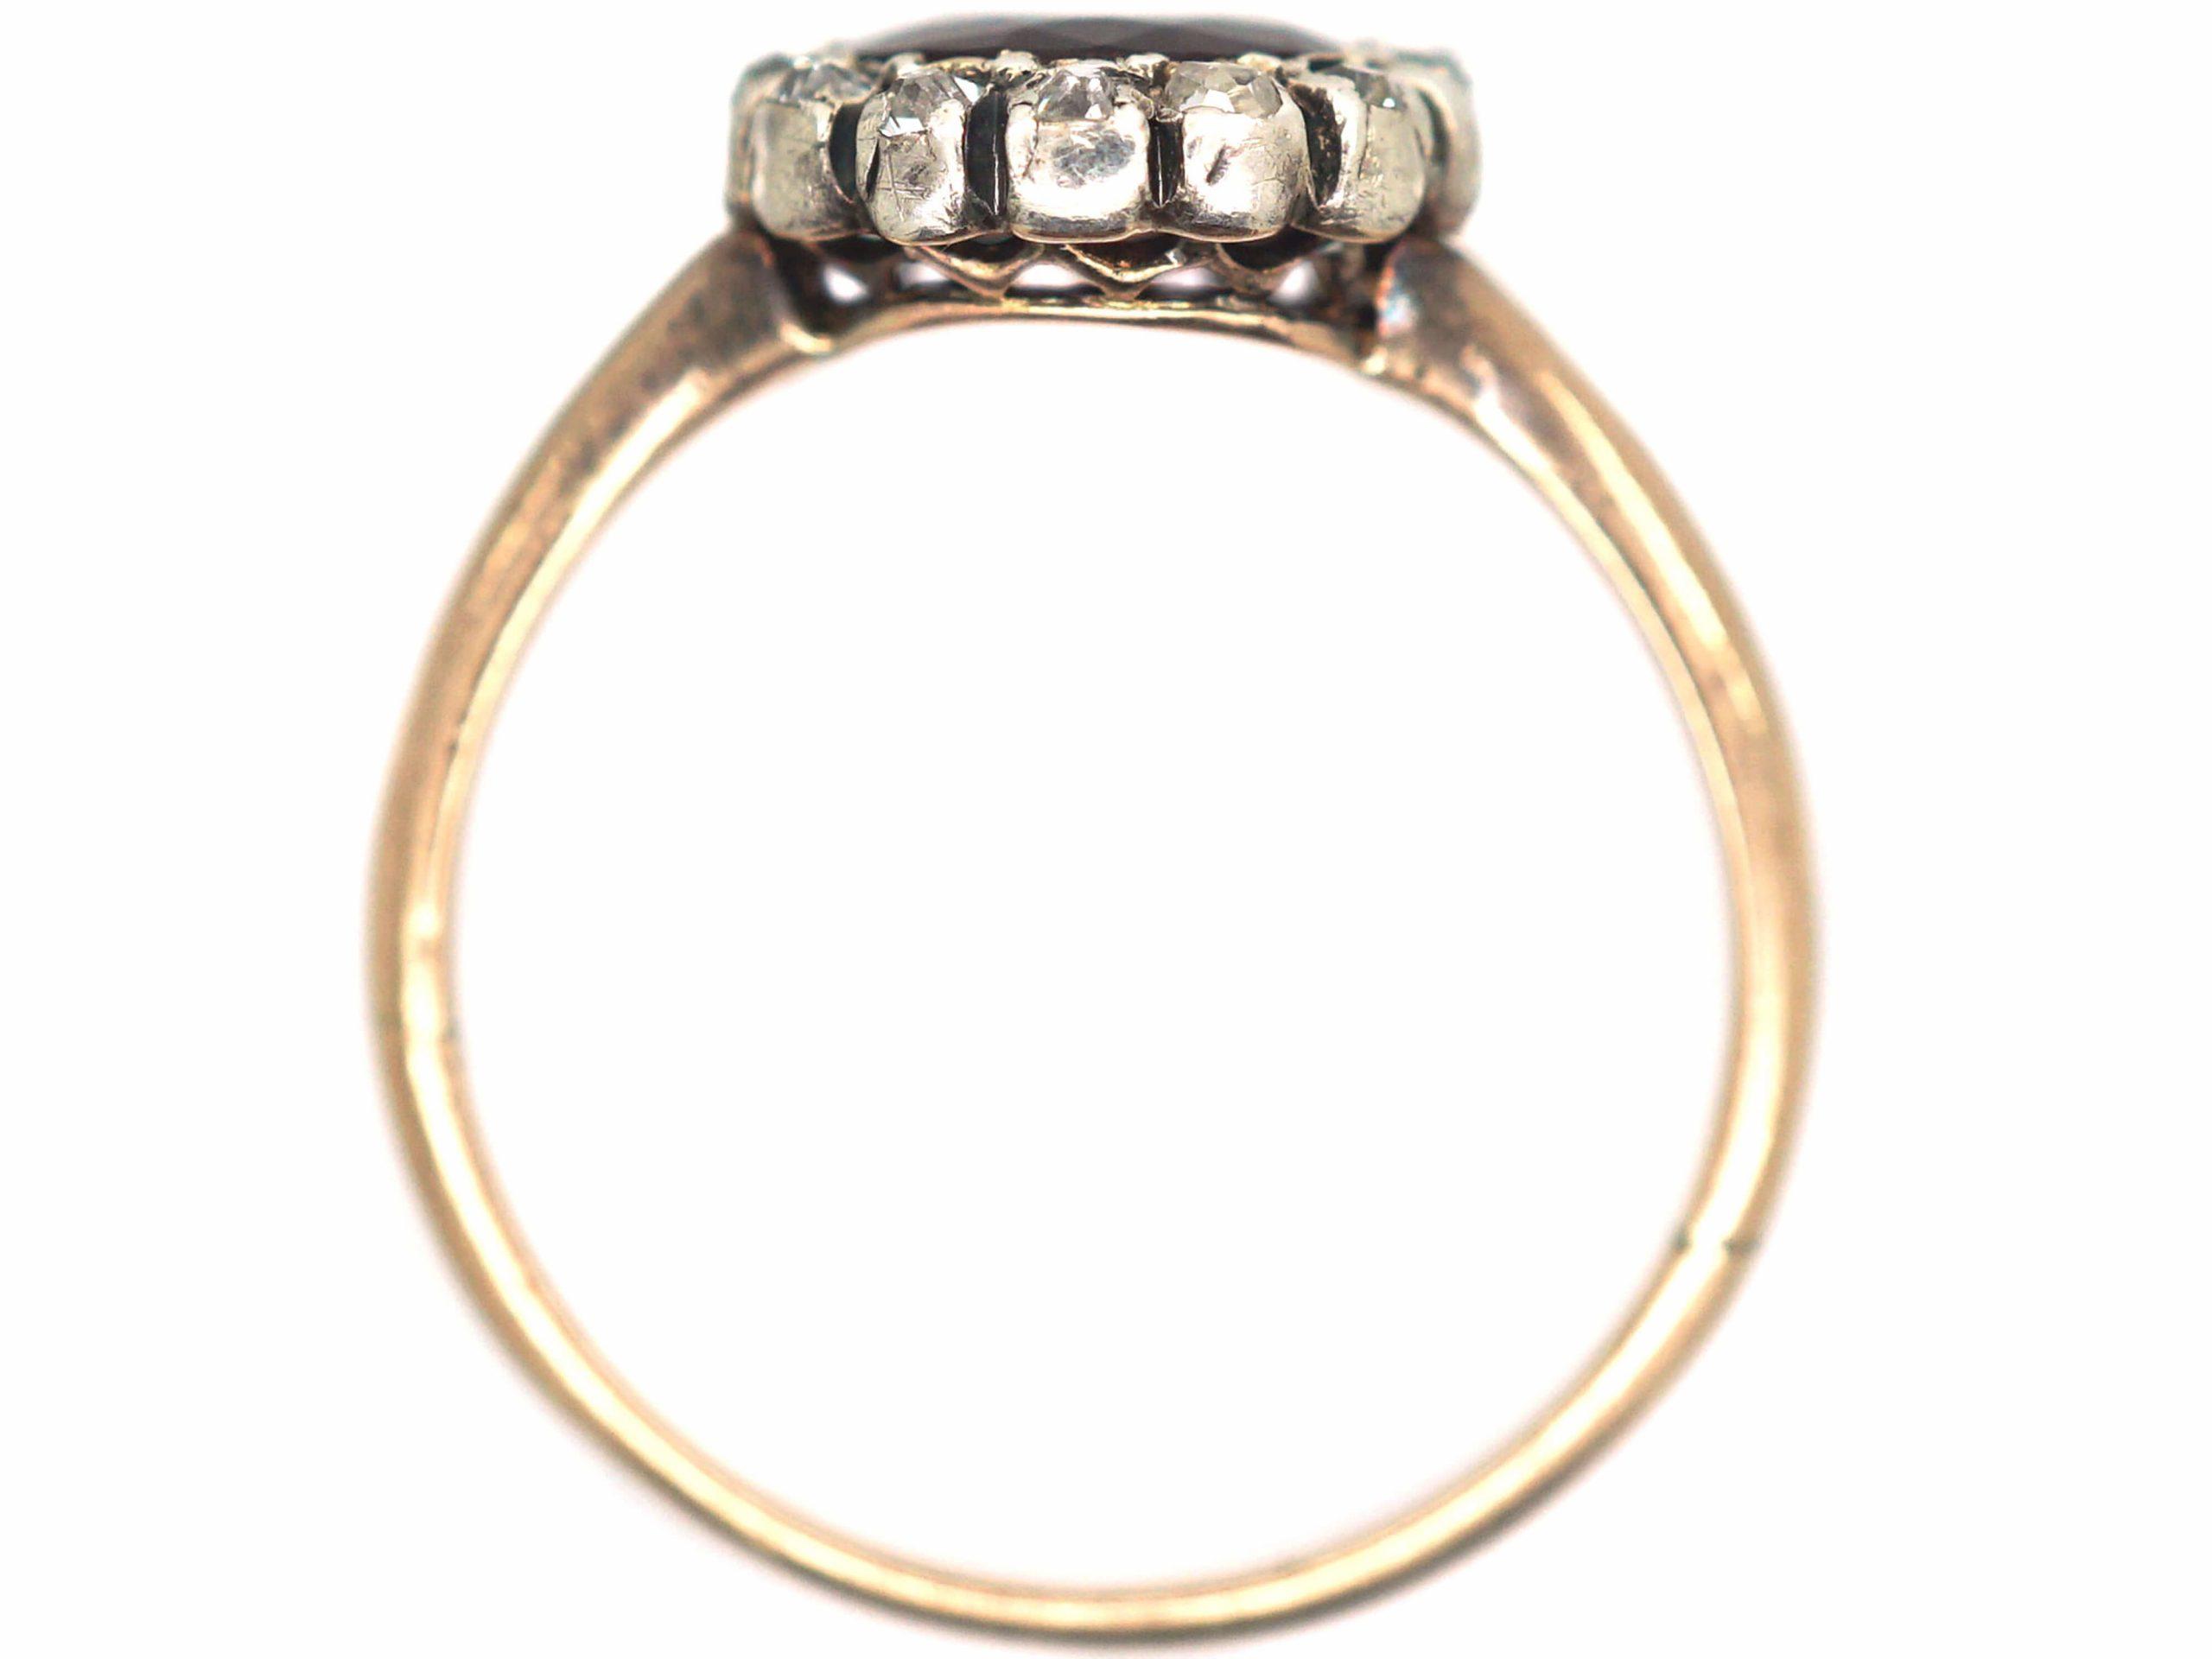 Victorian 14ct Gold, Garnet & Diamond Oval Cluster Ring